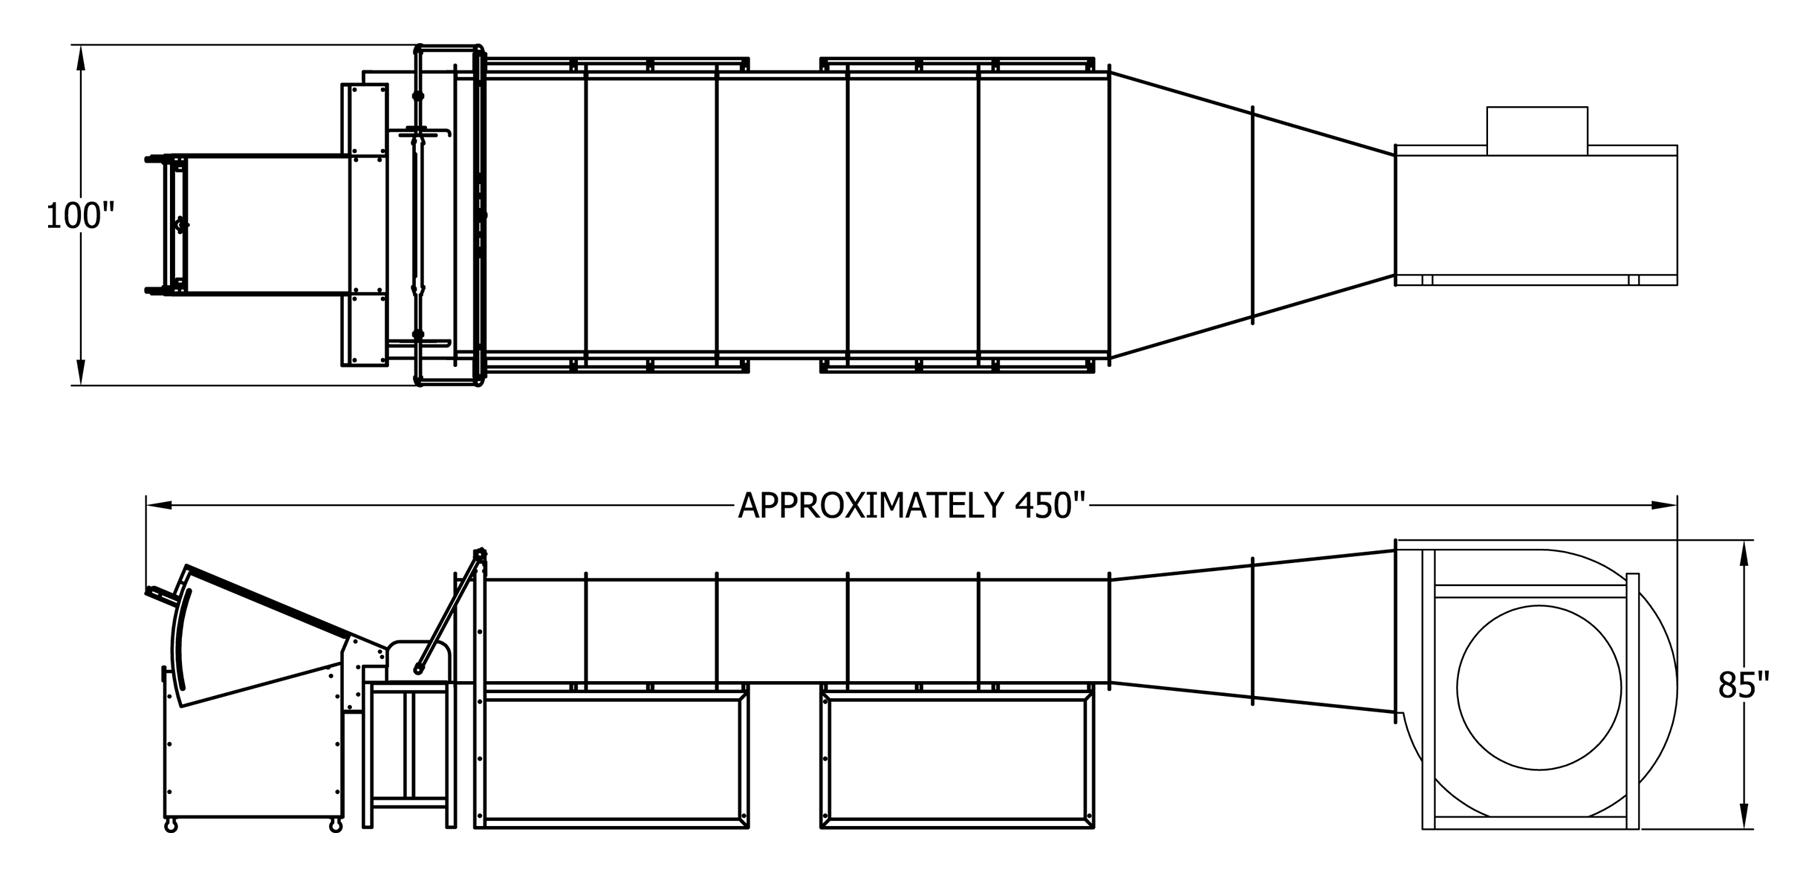 Govmark Fire Amp Flammability Test Instruments